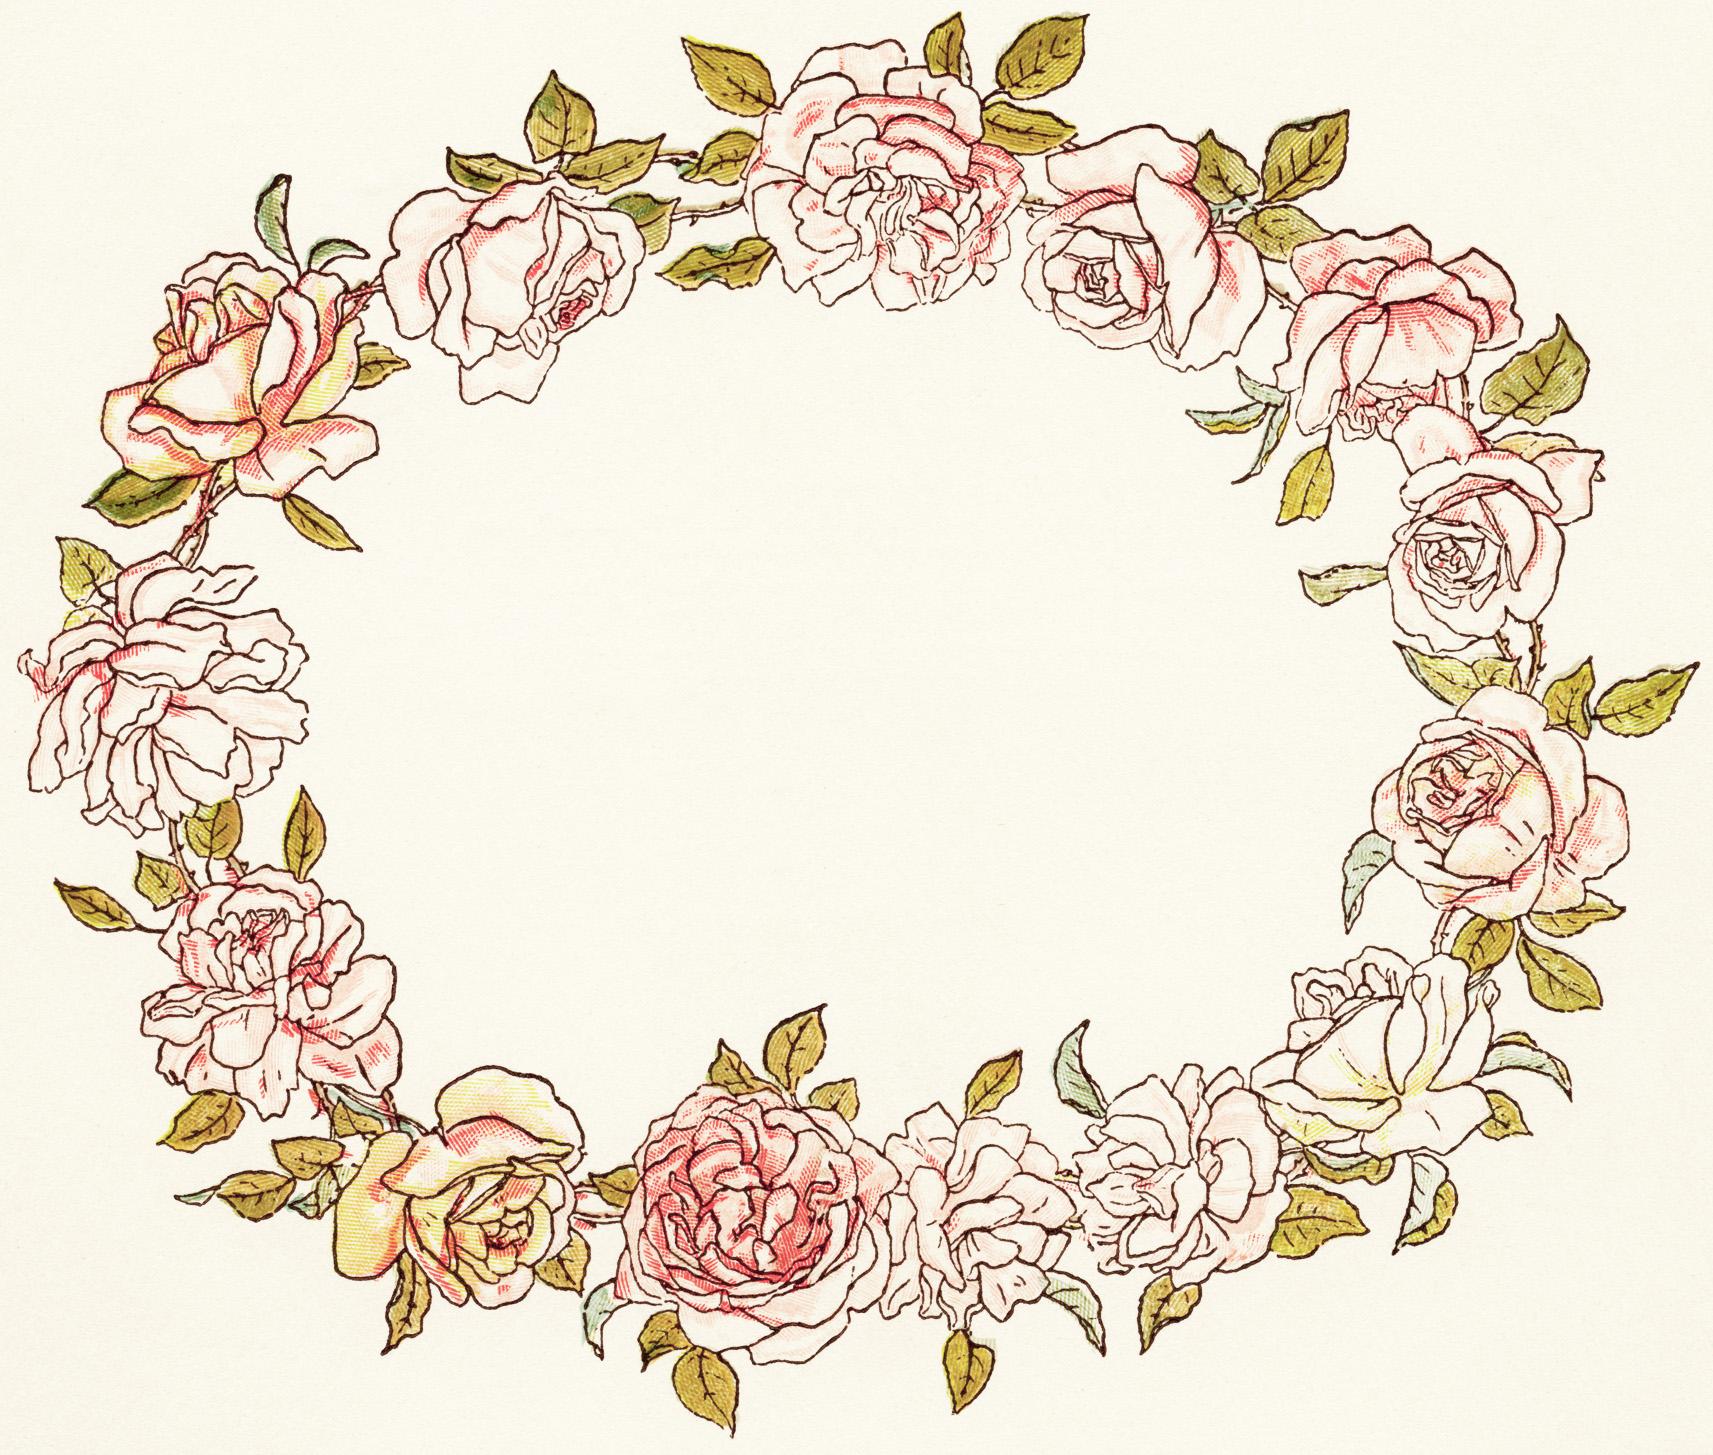 clipart flower wreath - photo #19